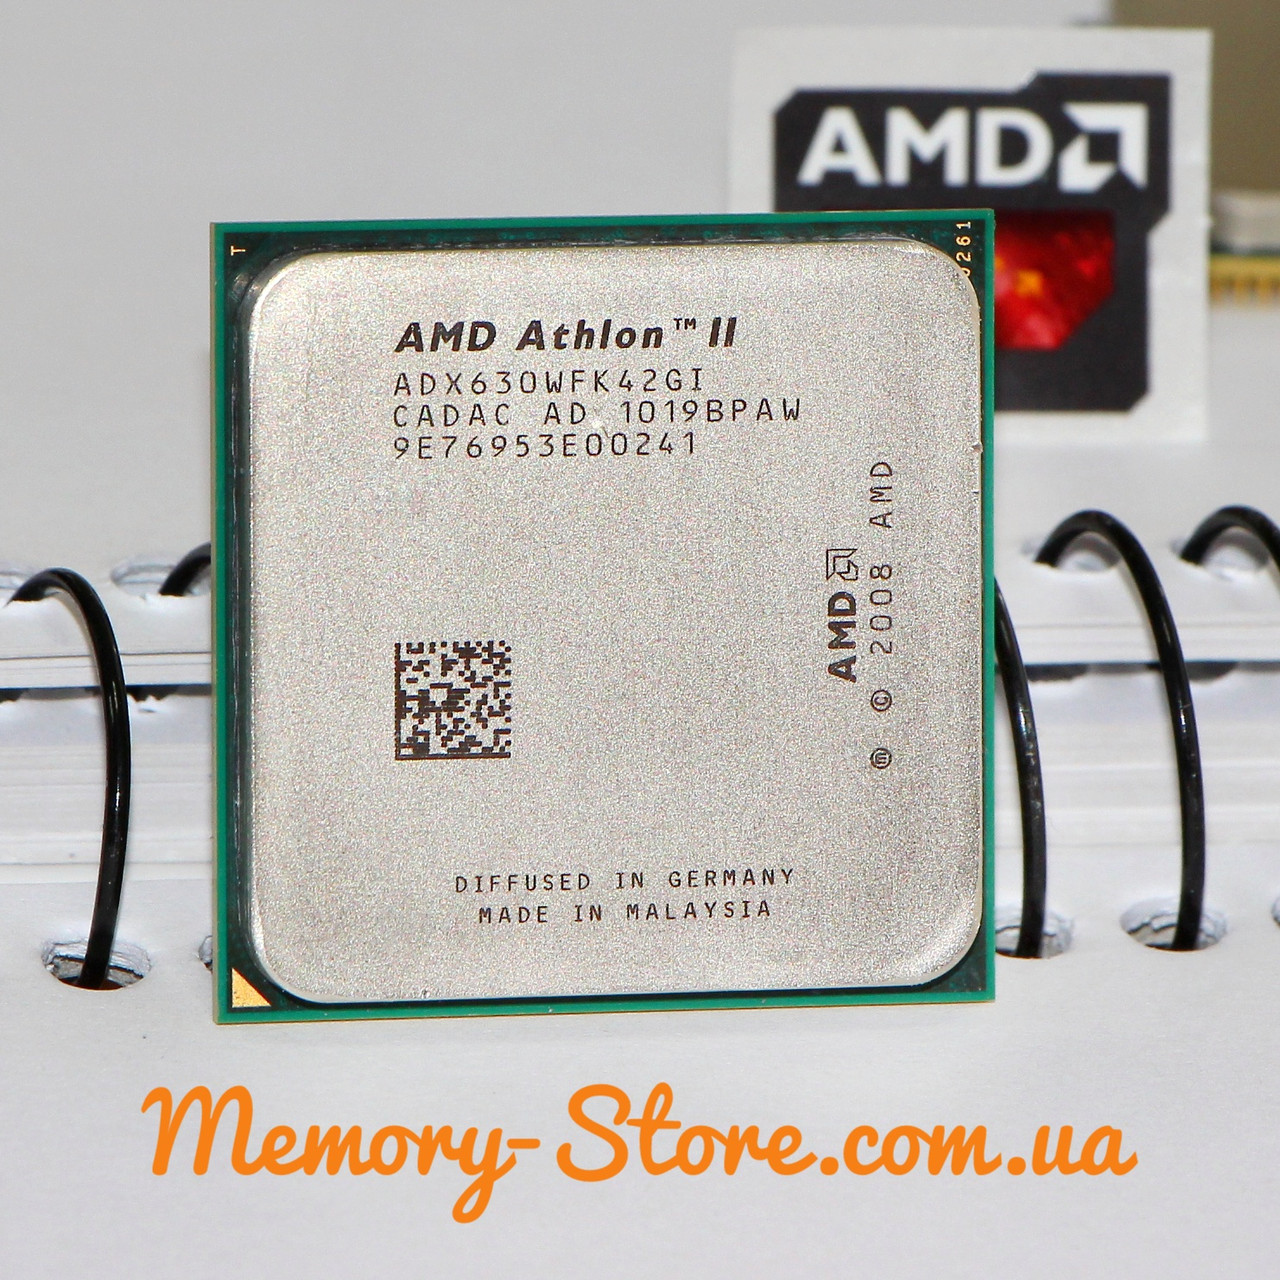 Процессор AMD Athlon II X4 630 2.8GHz, 95W + термопаста GD900